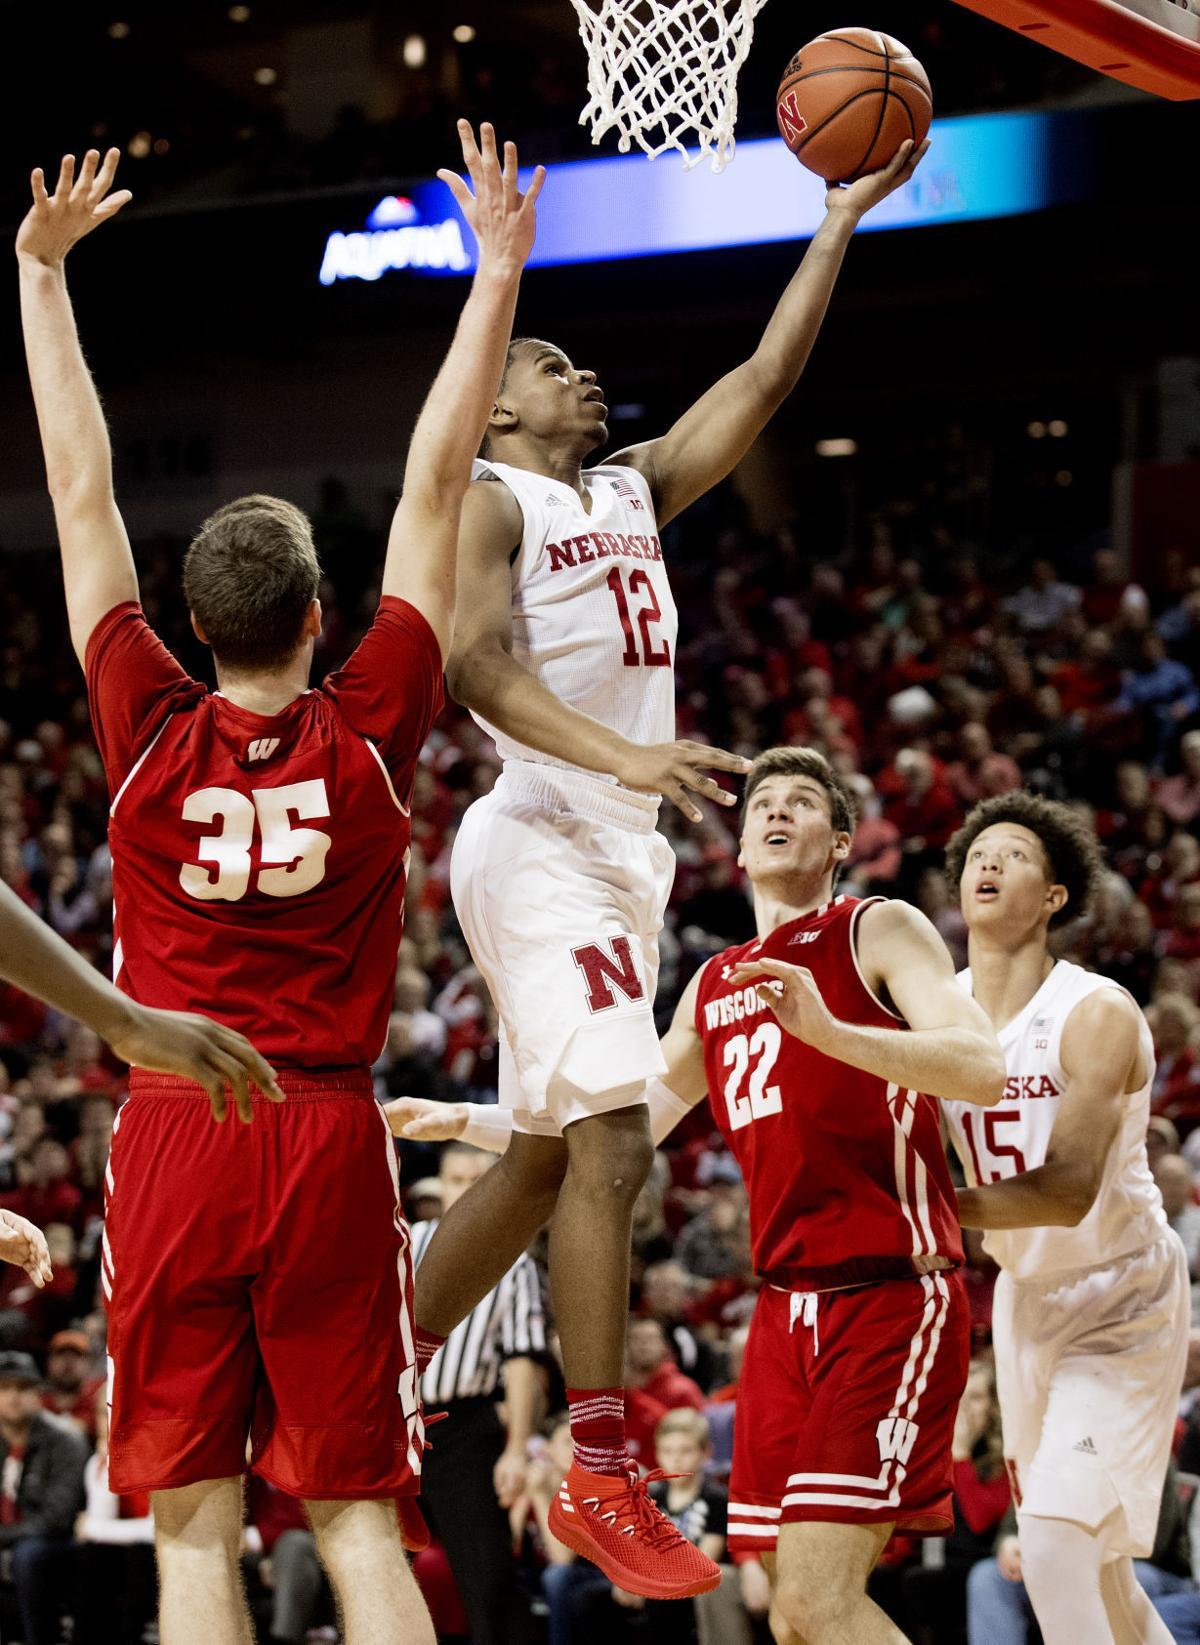 Wisconsin vs. Nebraska basketball, 1/9/18